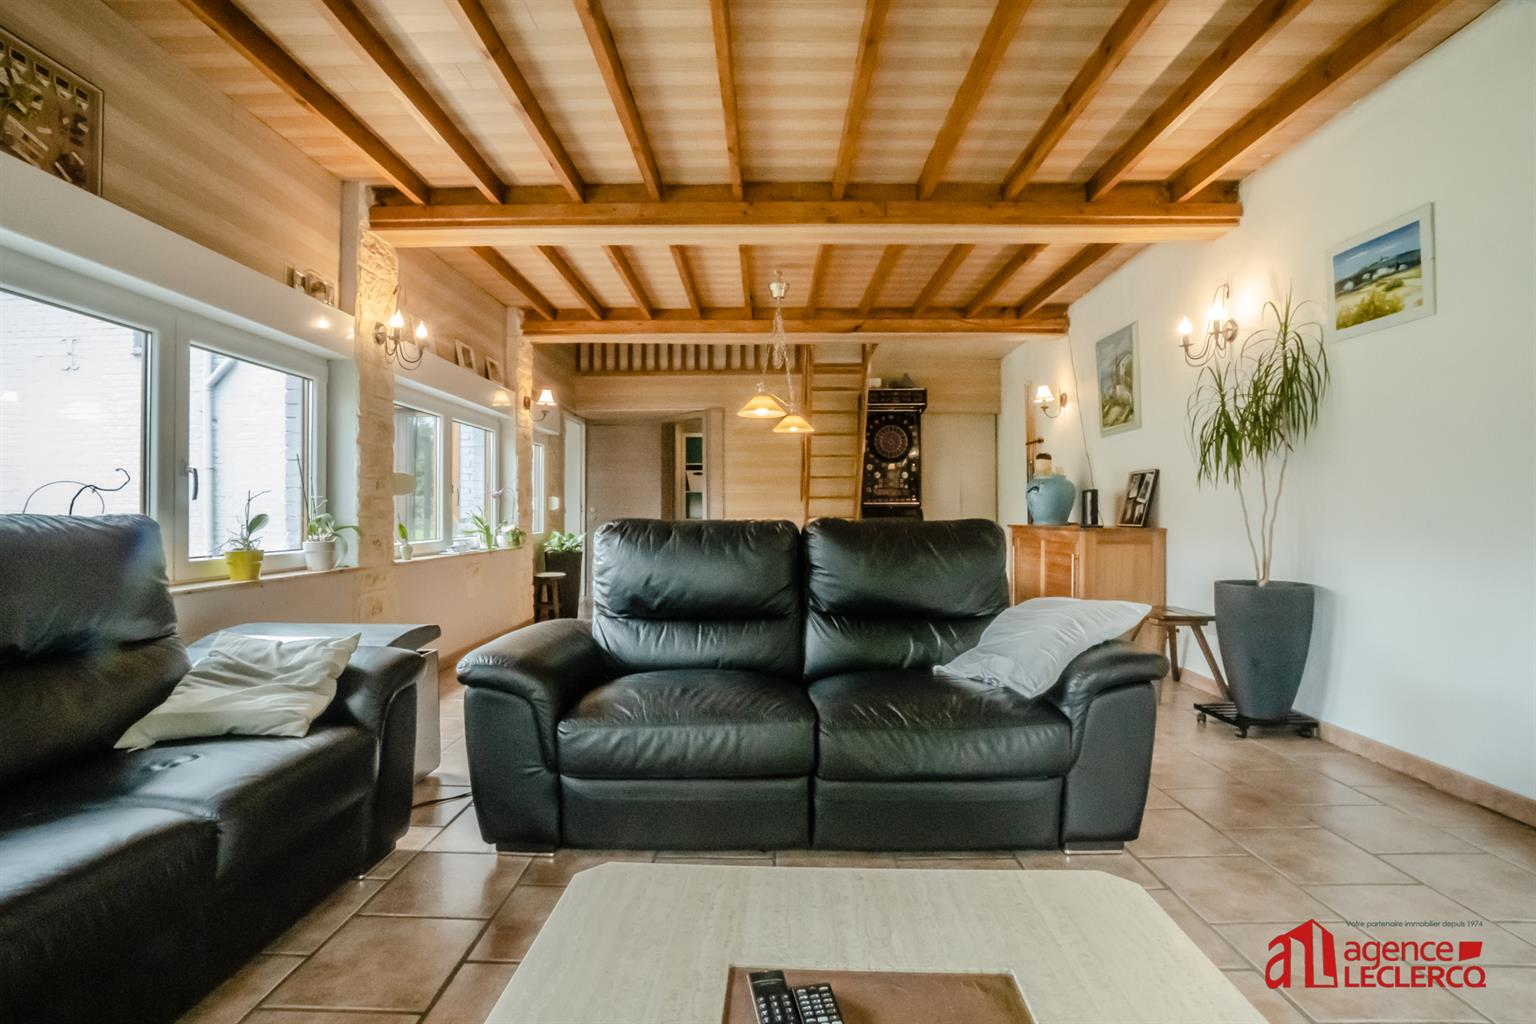 Maison - Gaurain-Ramecroix - #4408184-11